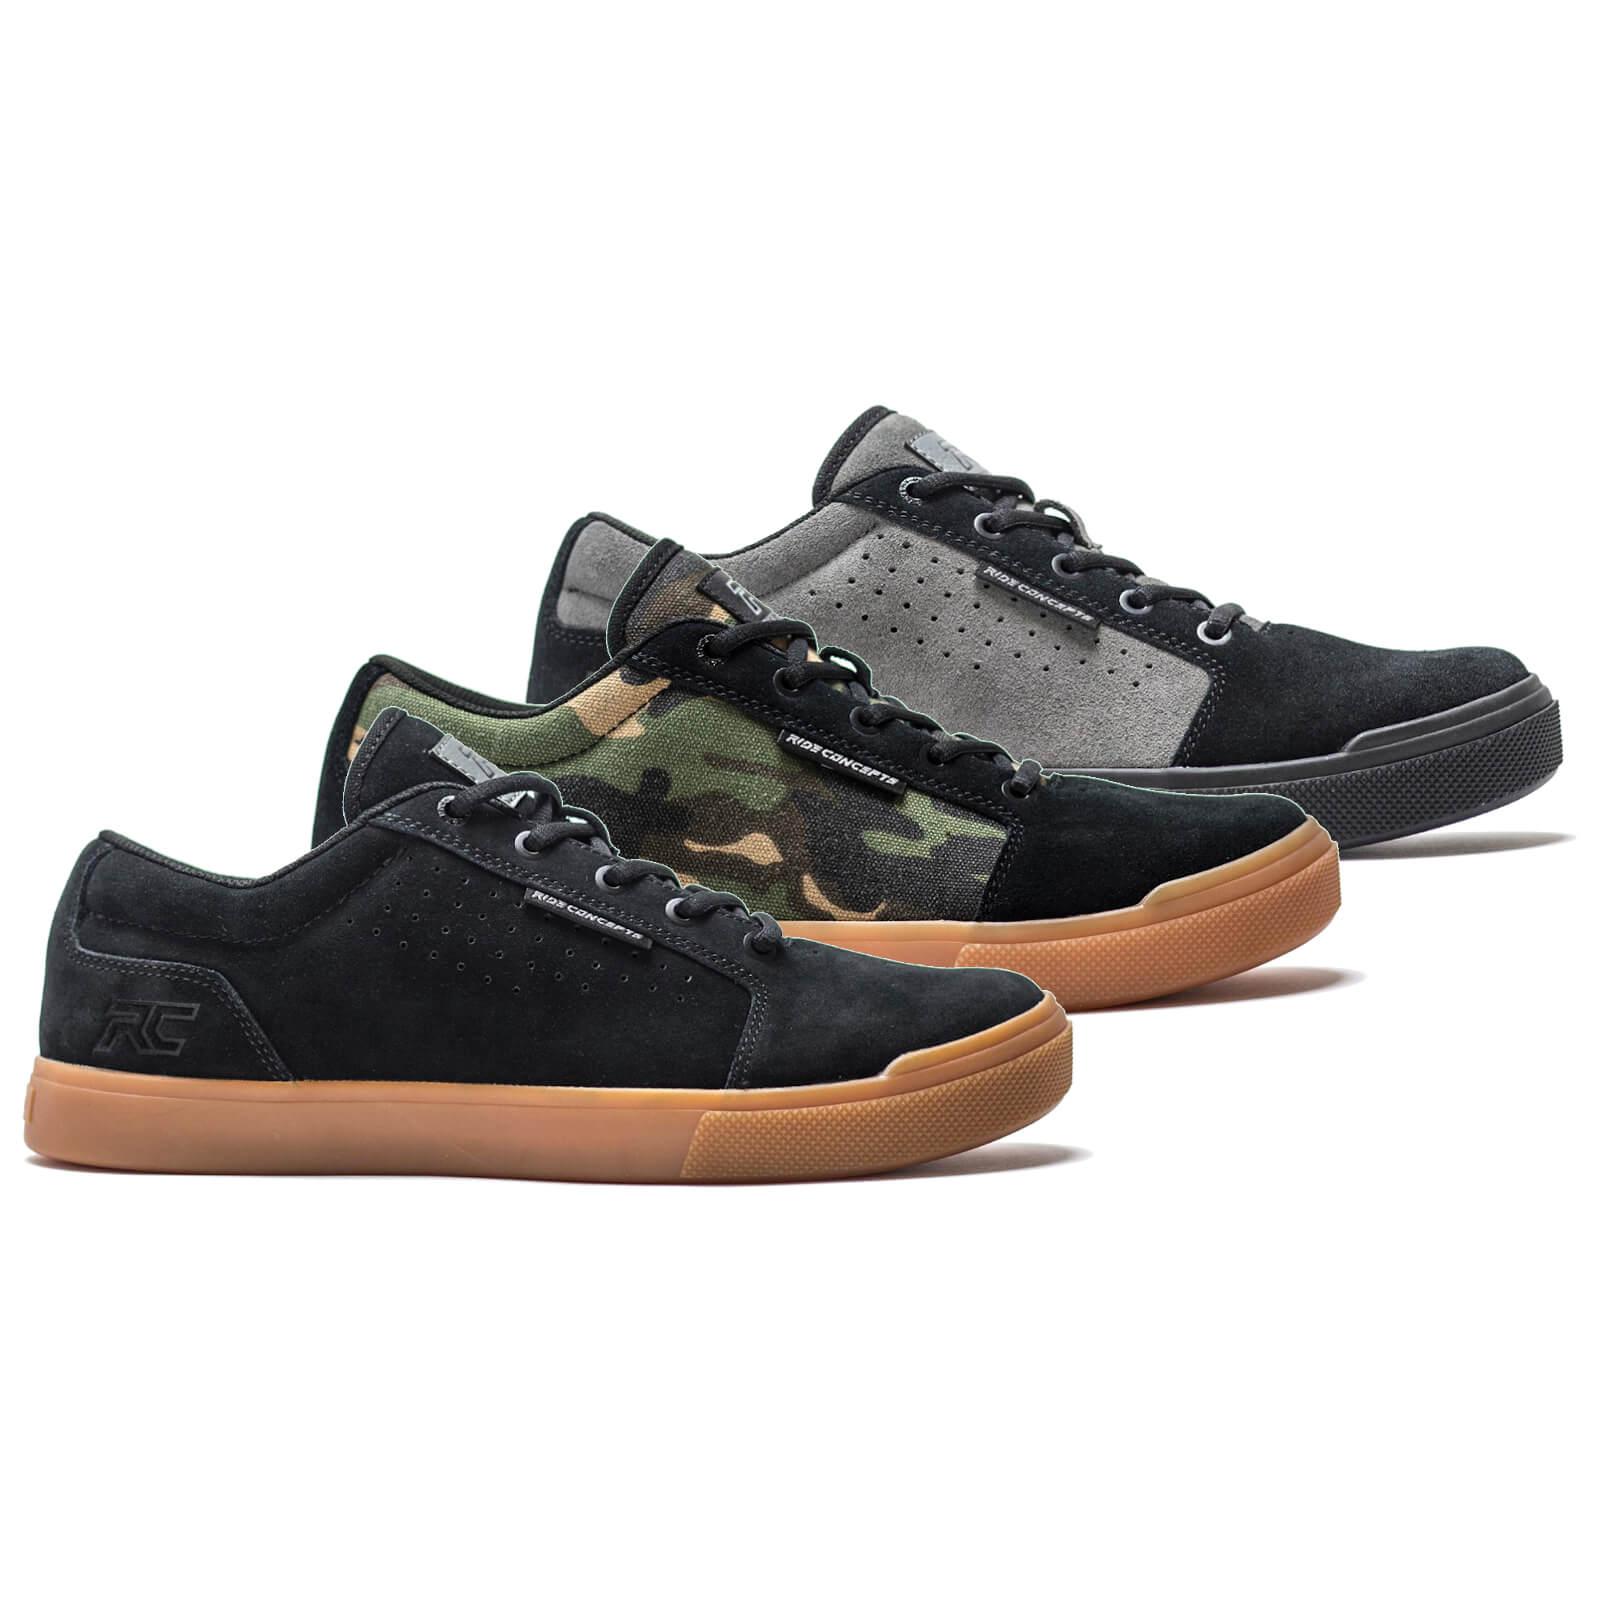 Ride Concepts Vice Flat MTB Shoes - UK 11/EU 45 - Schwarz